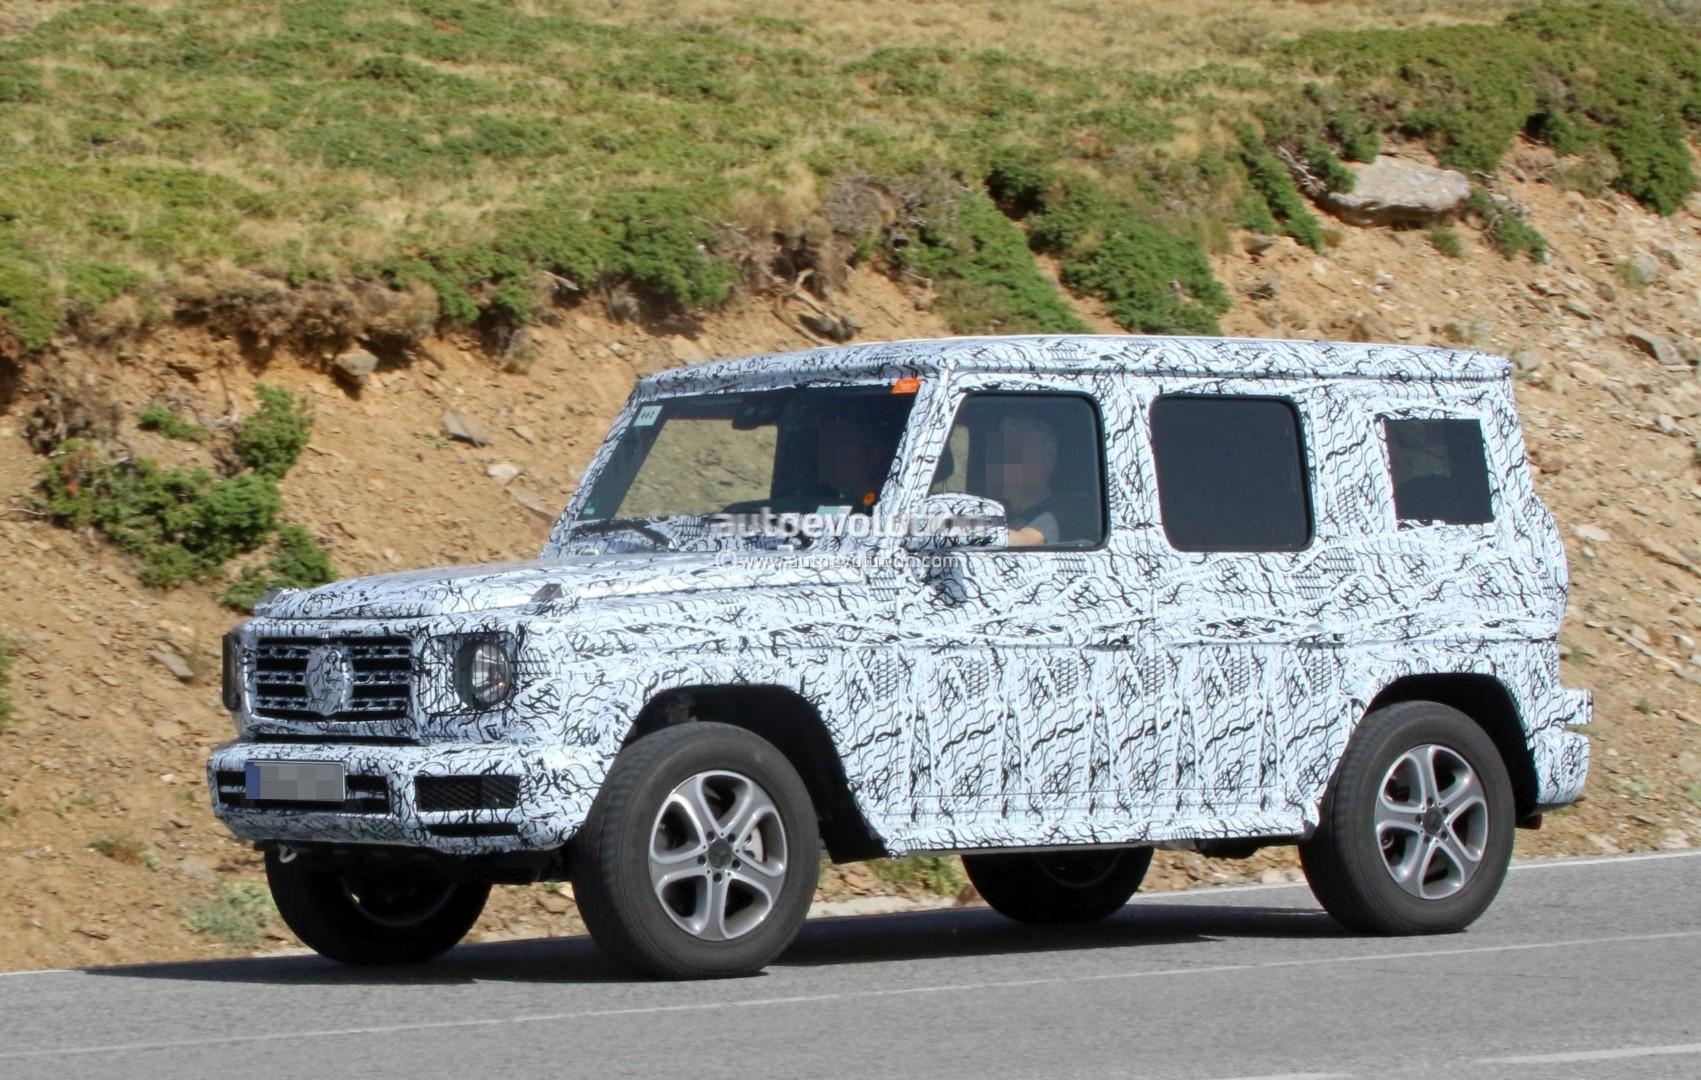 Next Generation Mercedes Benz G Class Dashboard Partially Revealed